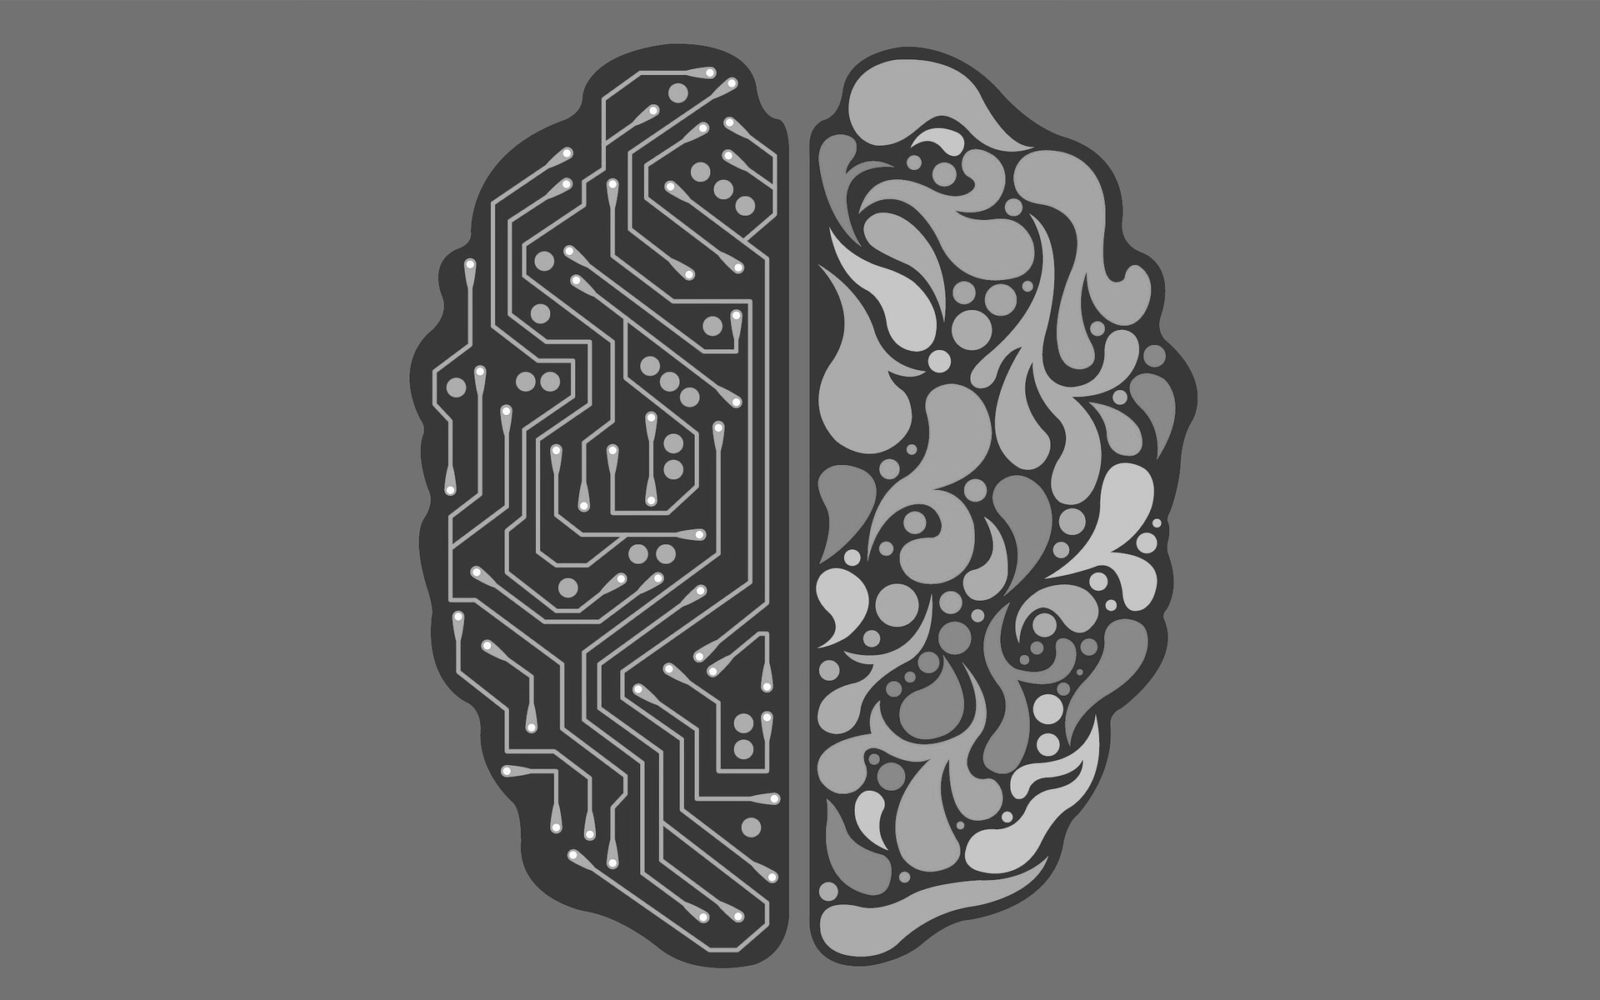 Gehirn Prothese gegen Demenz?